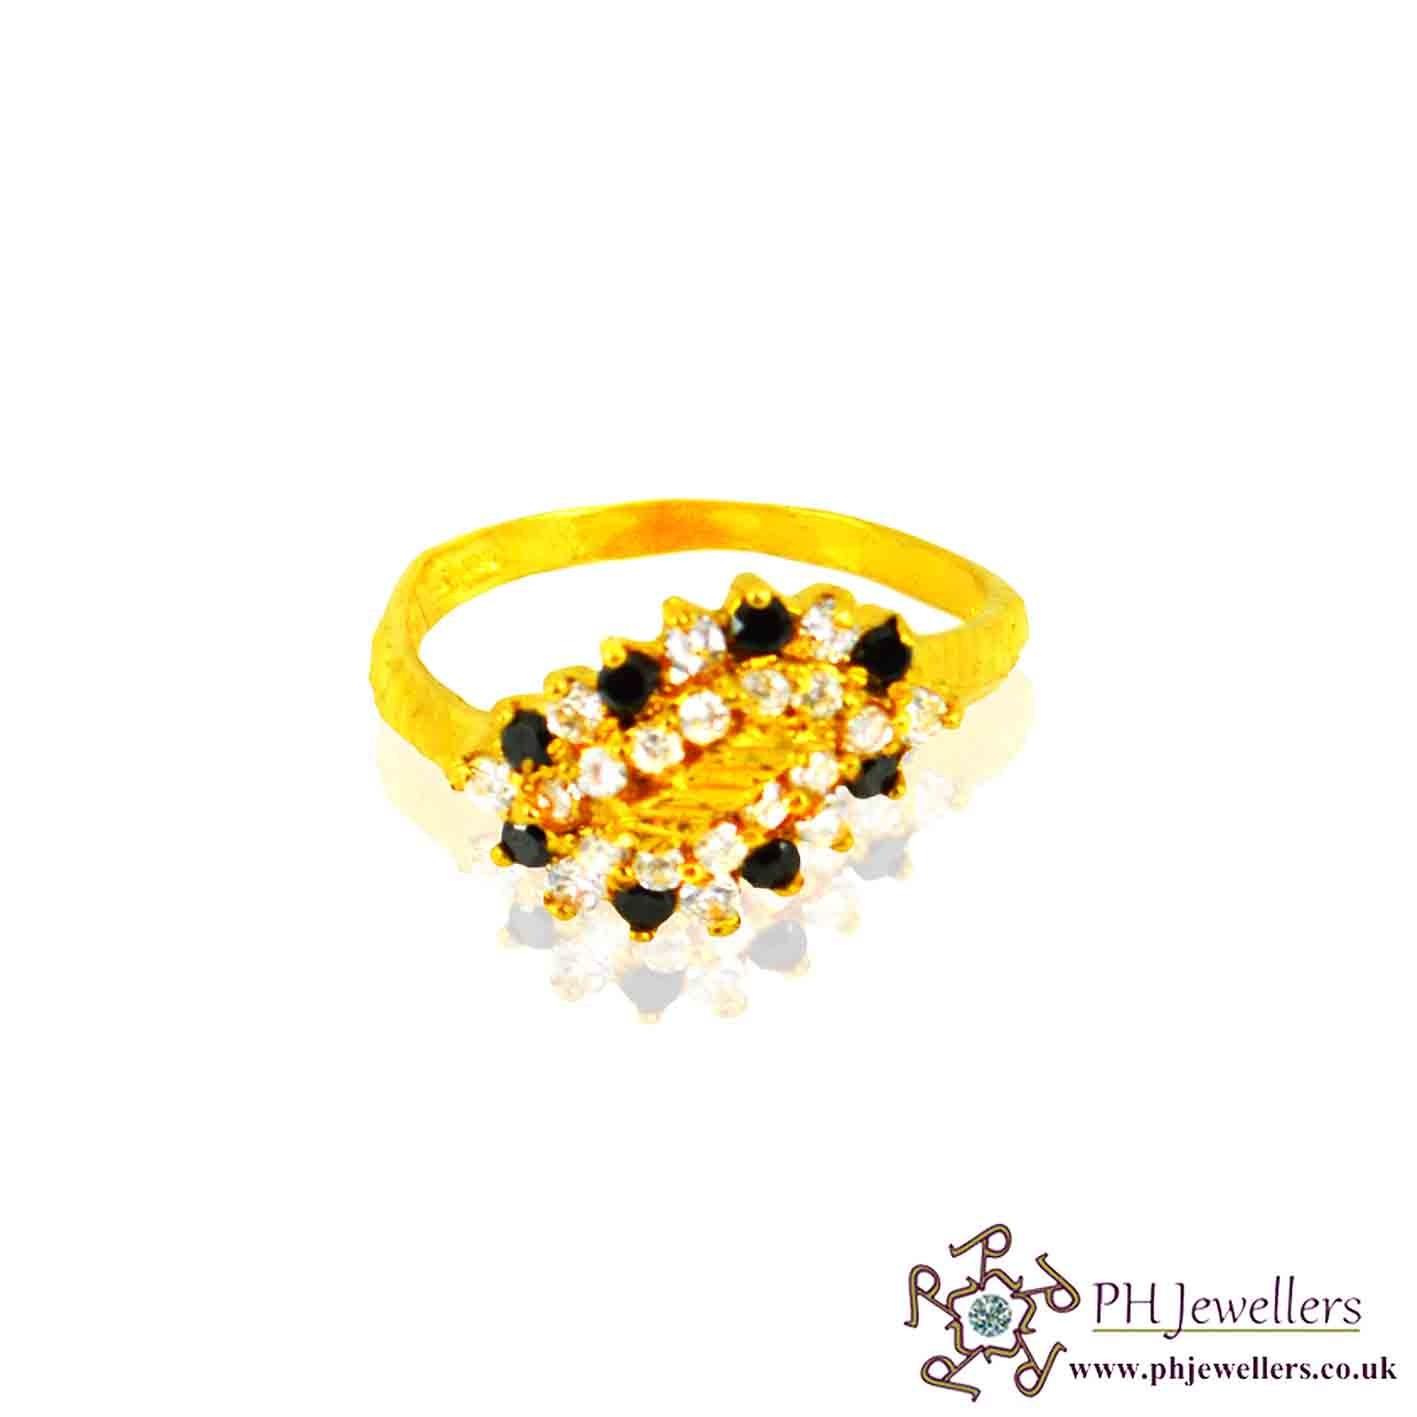 22ct 916 Hallmark Yellow Gold Black Size N,O Ring CZ SR32